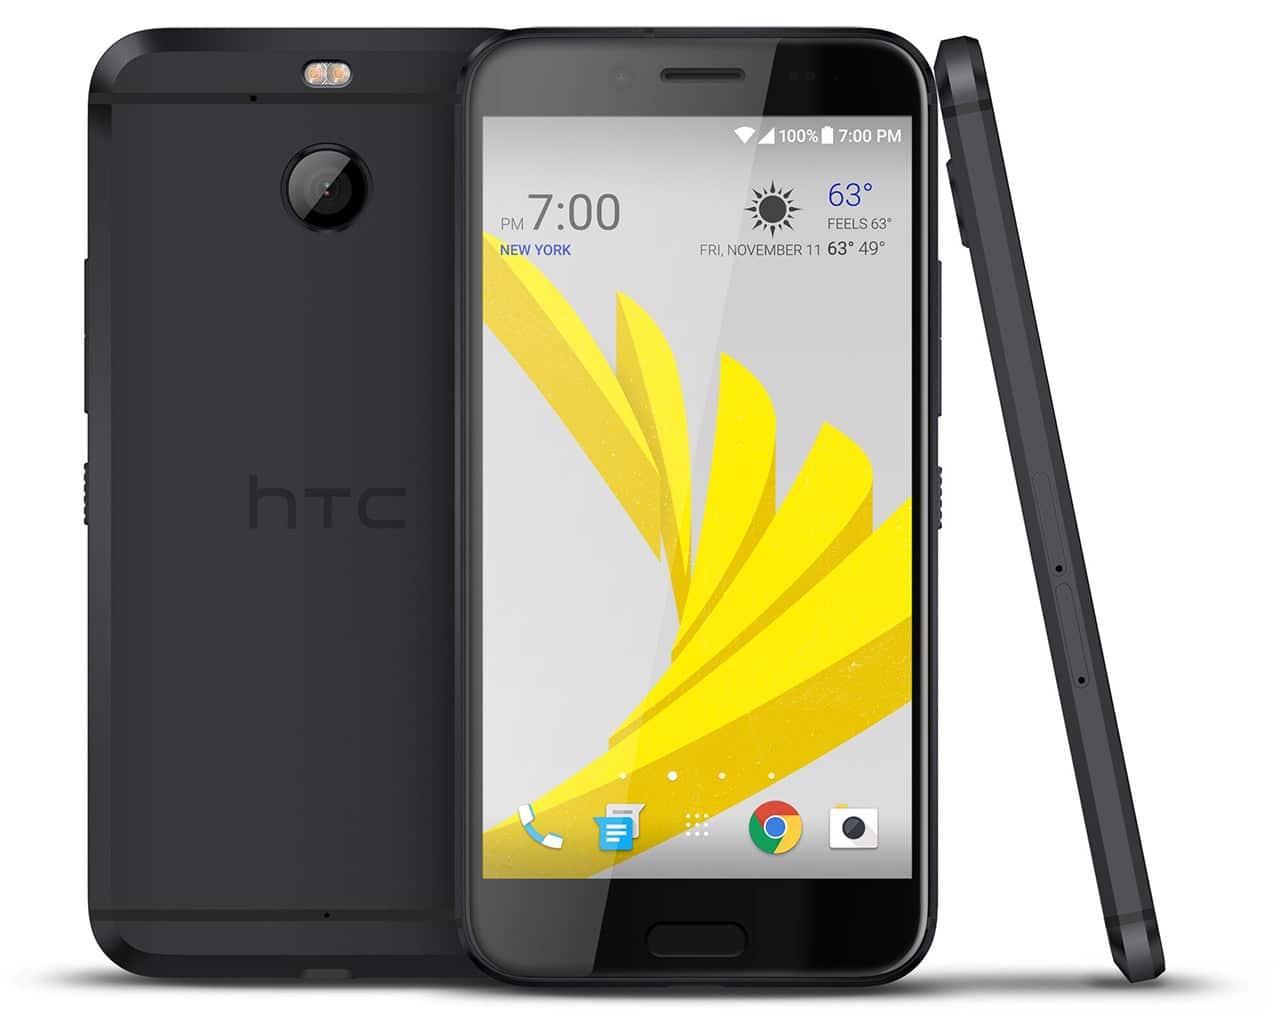 HTC Bolt in gunmetal